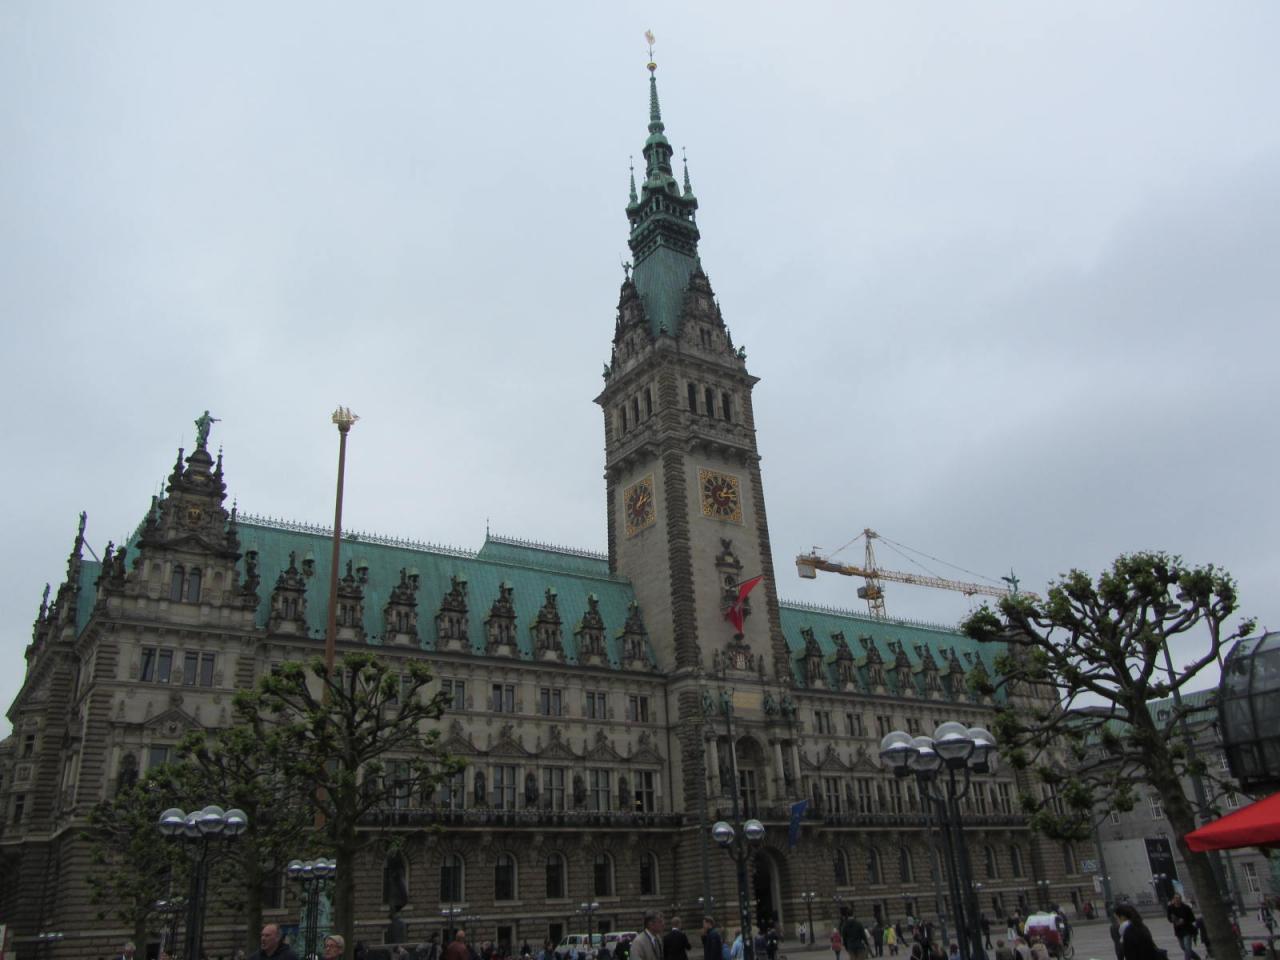 Mairie de Hamburg